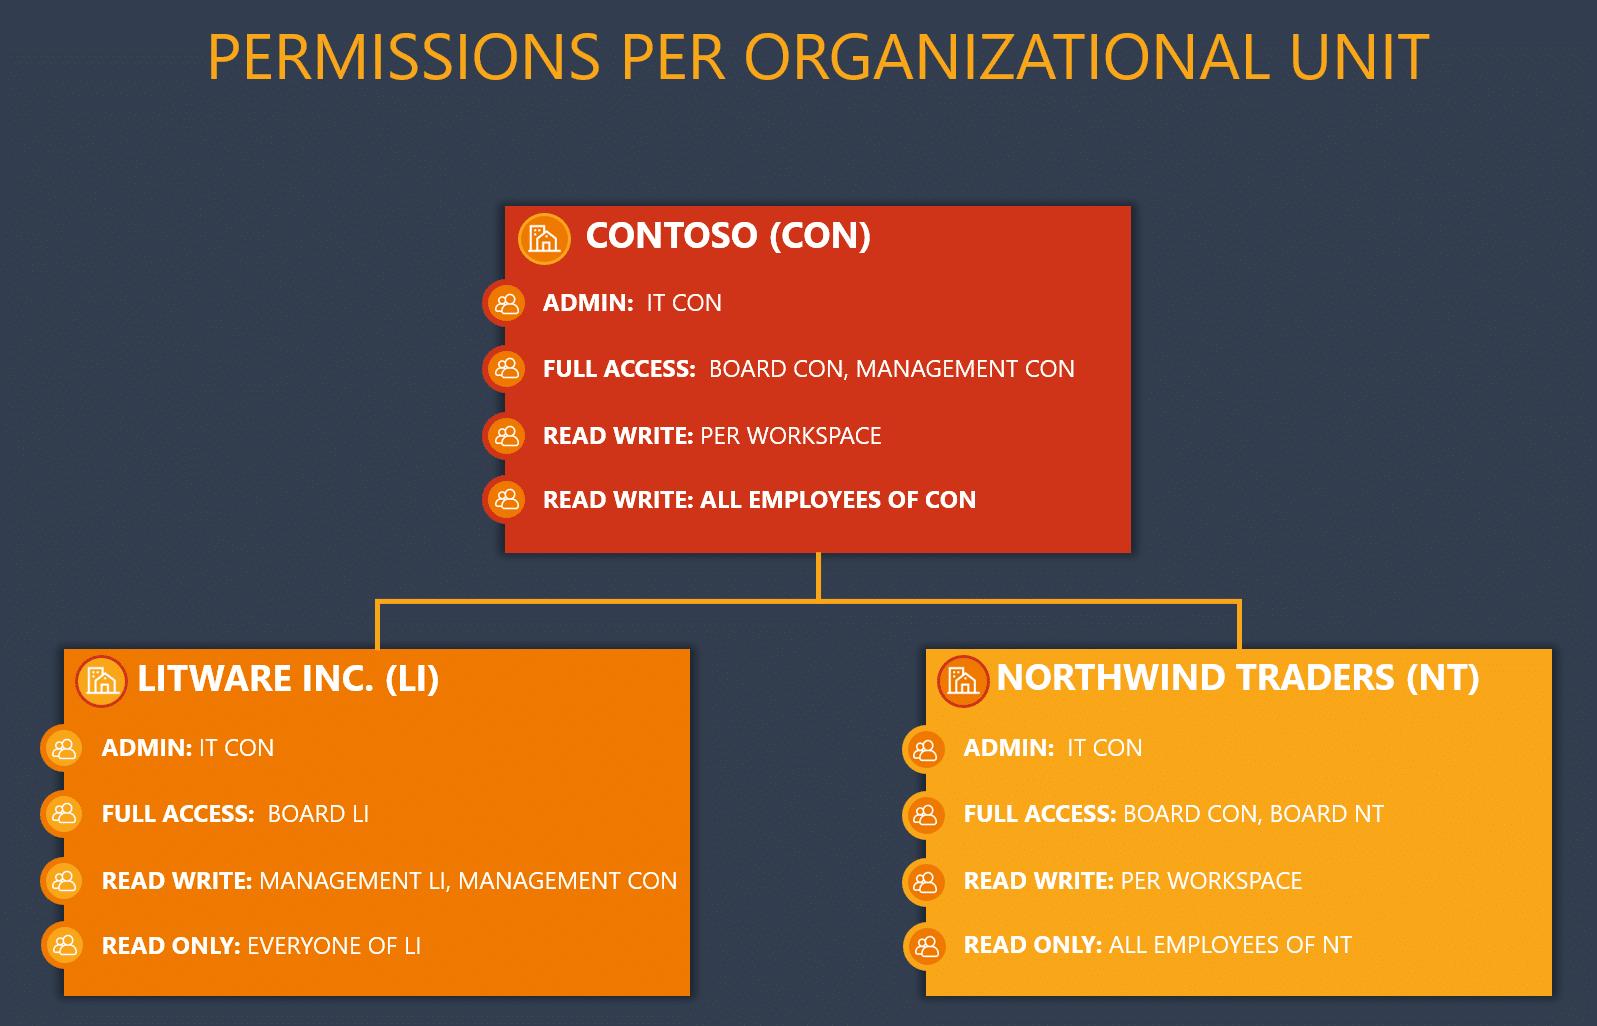 Permissions per org unit